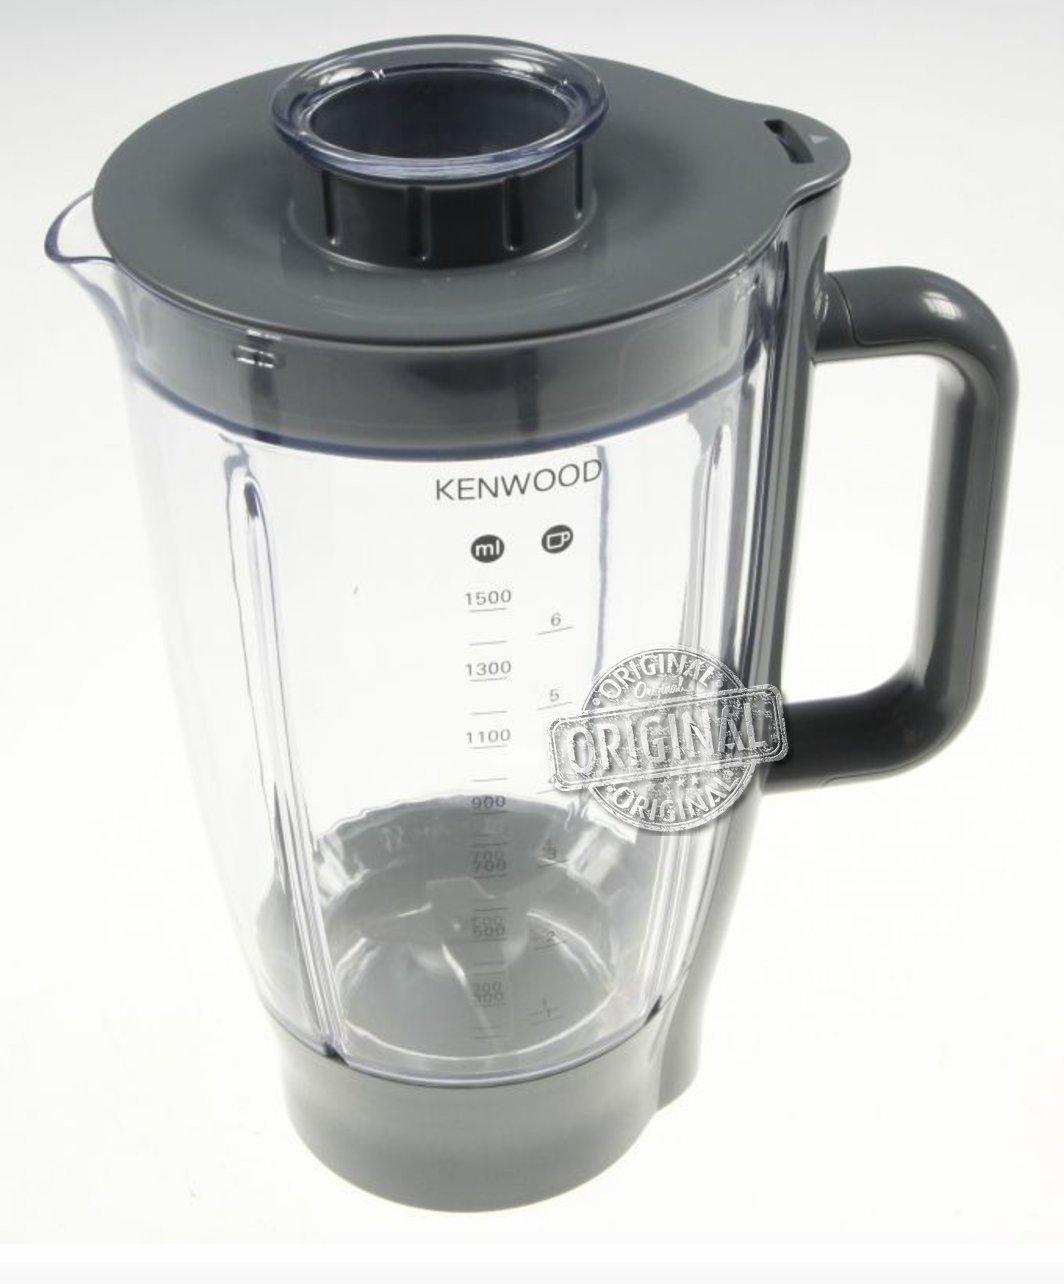 Frullatore Completo in Acrilico 1,5 LT. Originale Kenwood per Kitchen Machine Prospero KM280, KM282, KM283, KM285, KM286, KM287, KM288, KM289 CAREservice